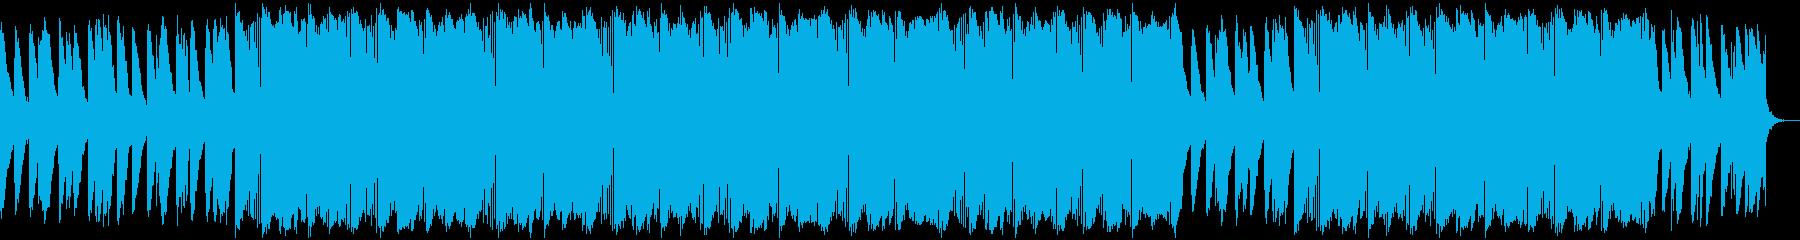 Piano Jazzy Beatの再生済みの波形